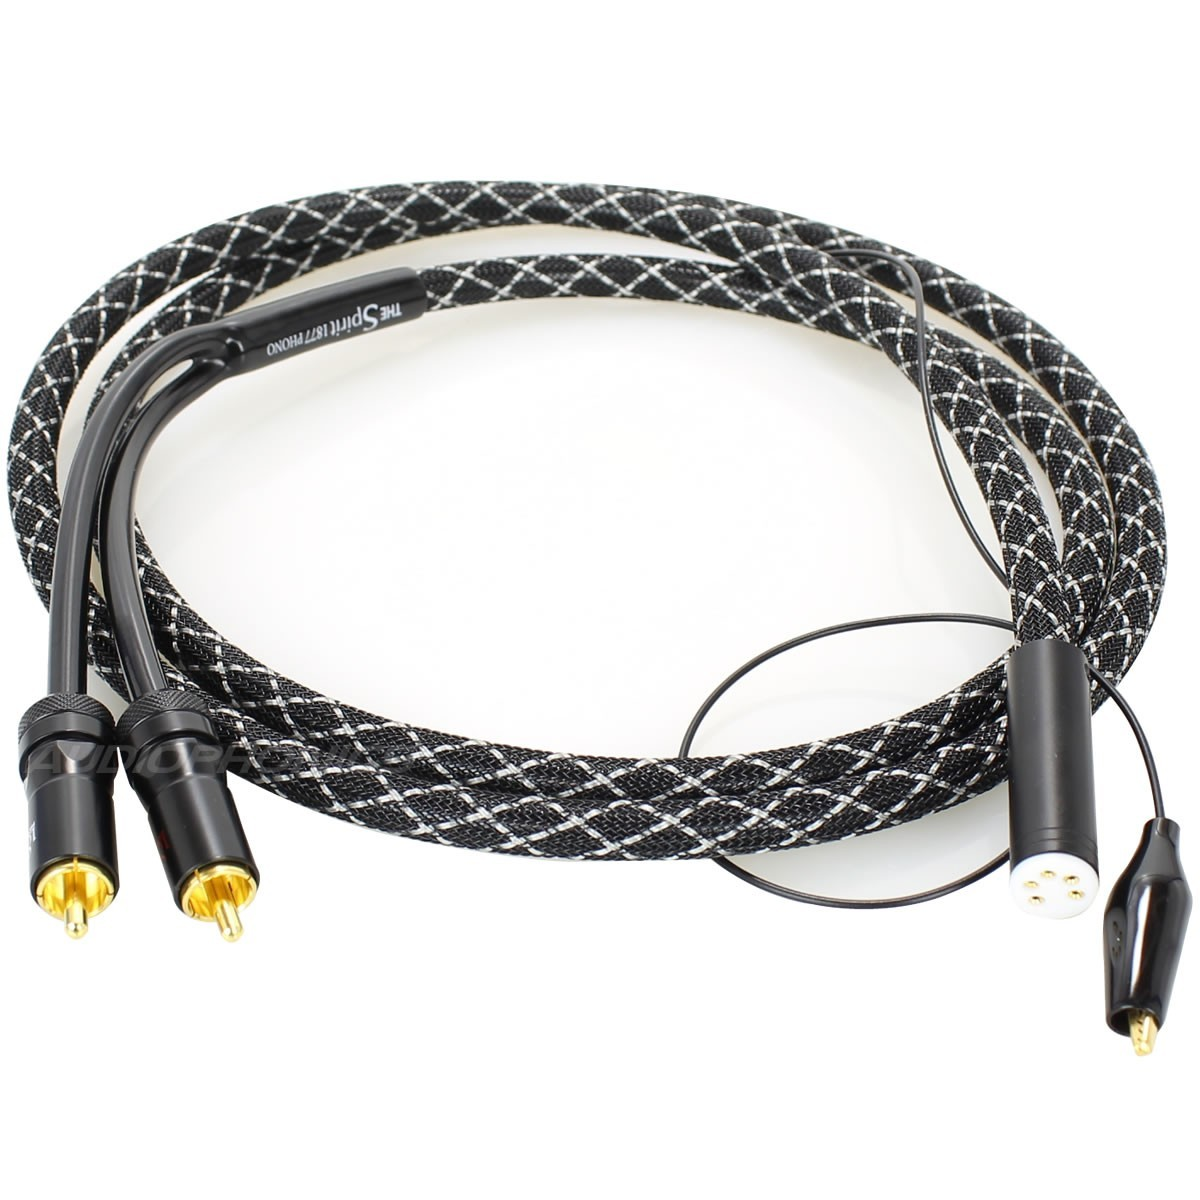 1877PHONO THE SPIRIT ST Phono Cable DIN female 5 Pin - 2 RCA Black 1.5m